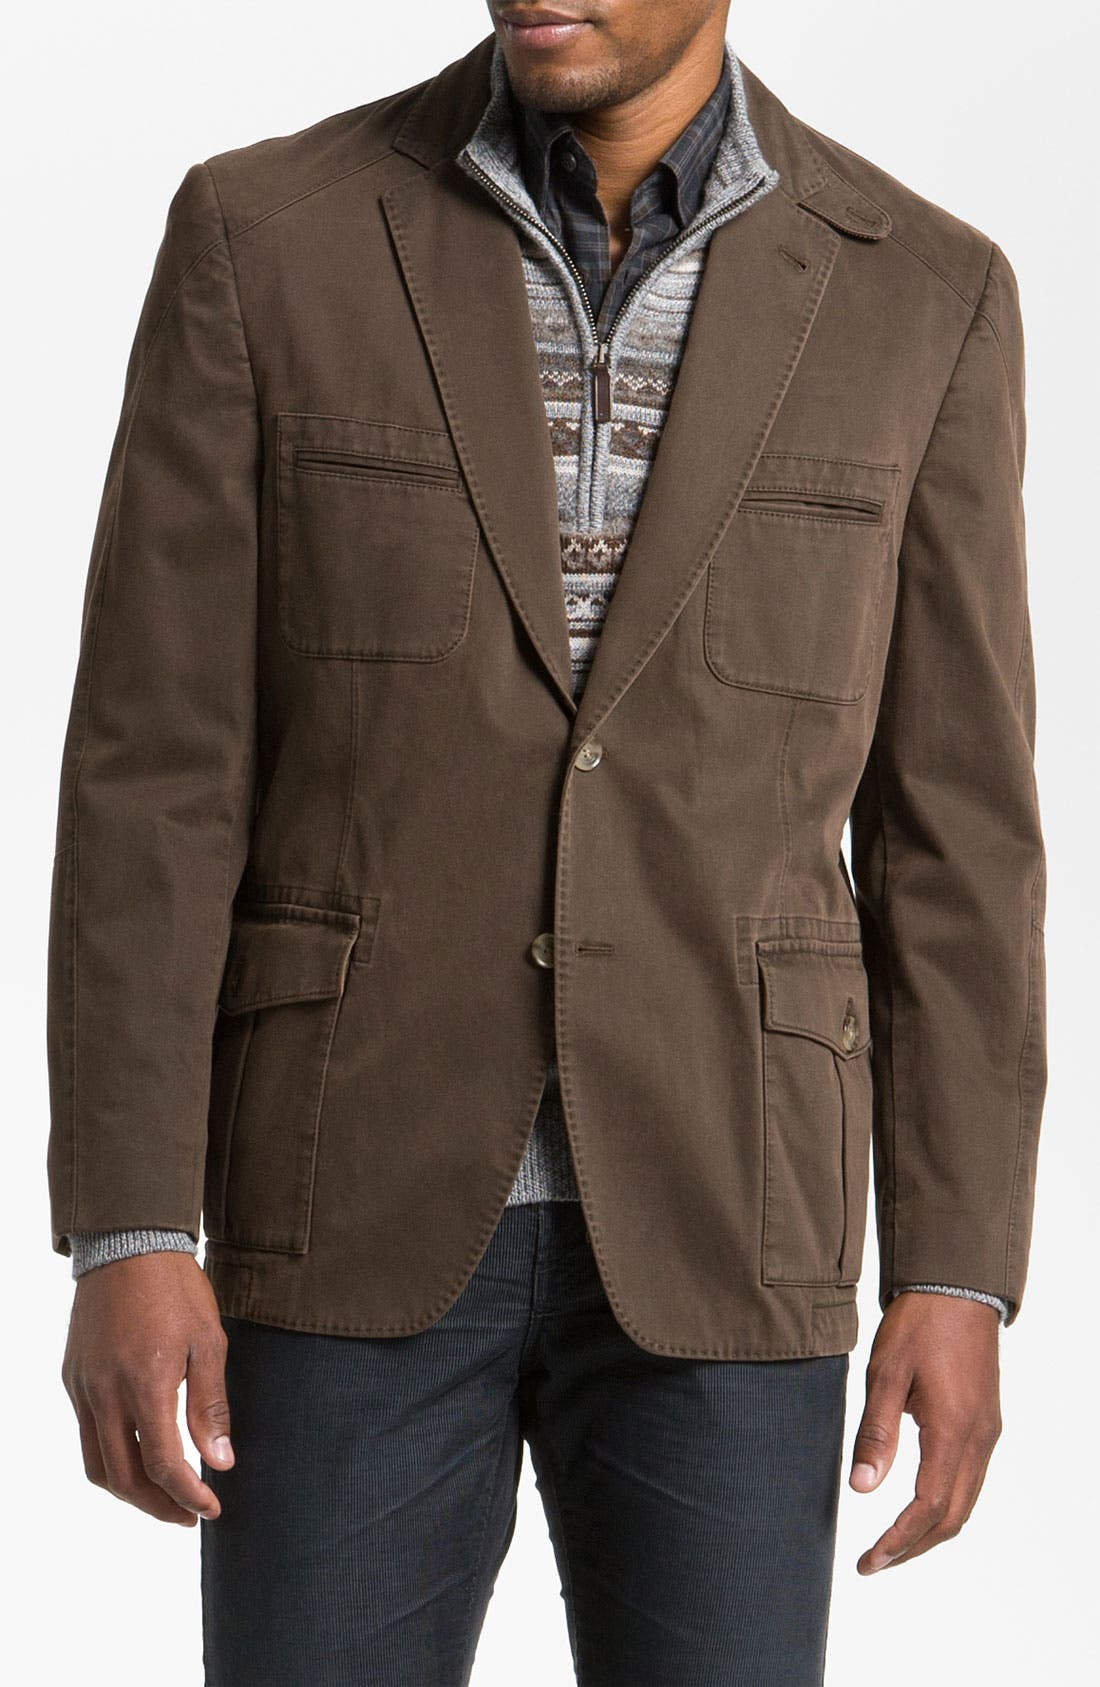 Alternate Image 1 Selected - Kroon 'Matthews' Brushed Cotton Sportcoat